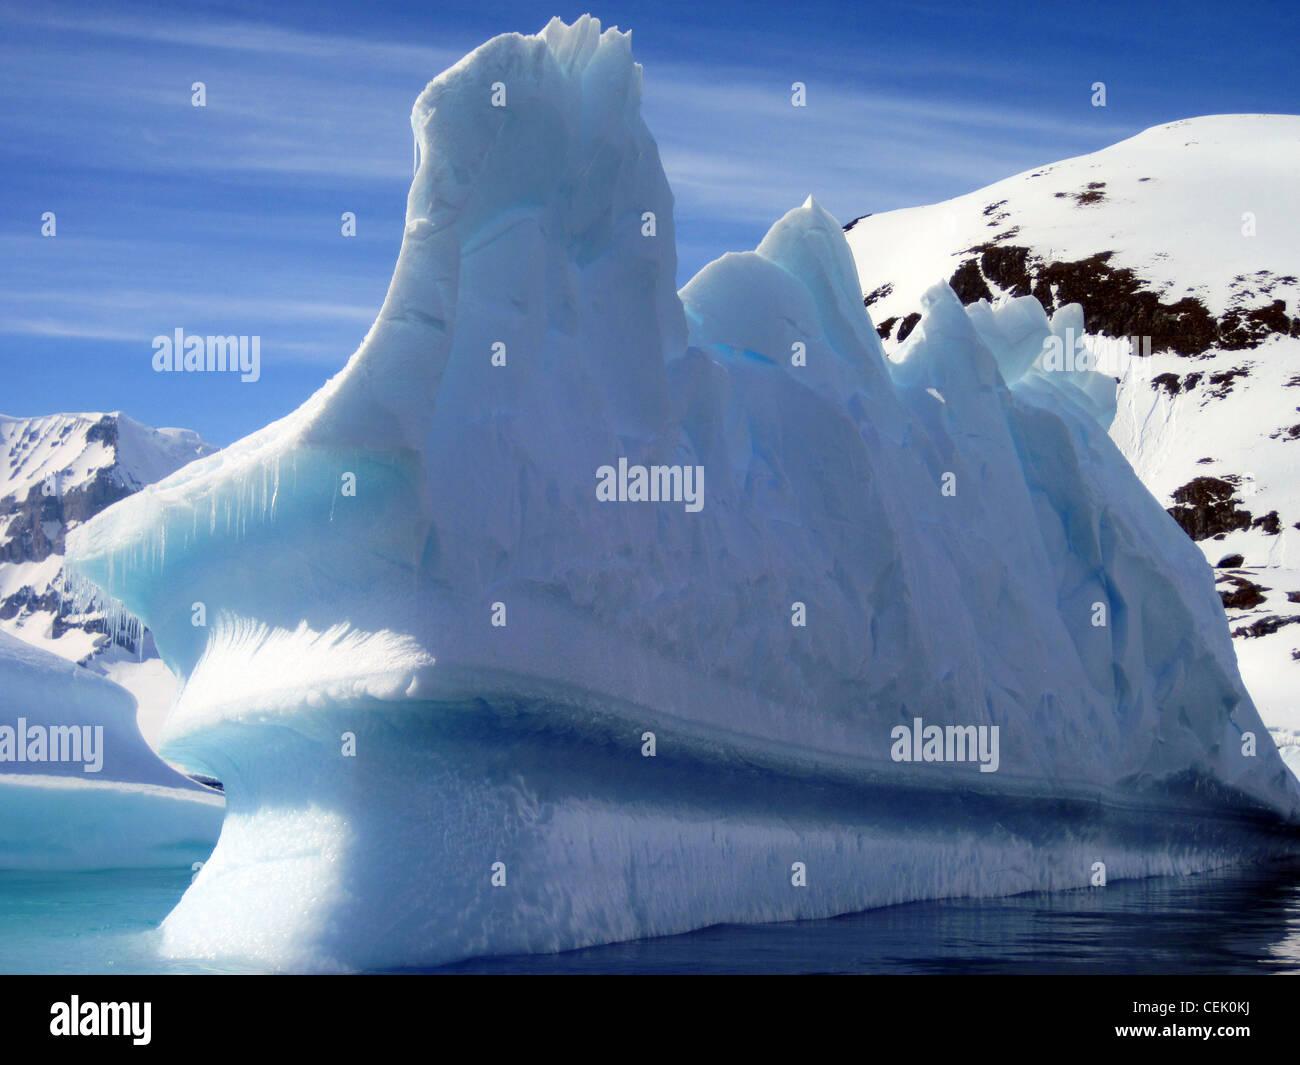 Iceberg in Antarctica - Stock Image